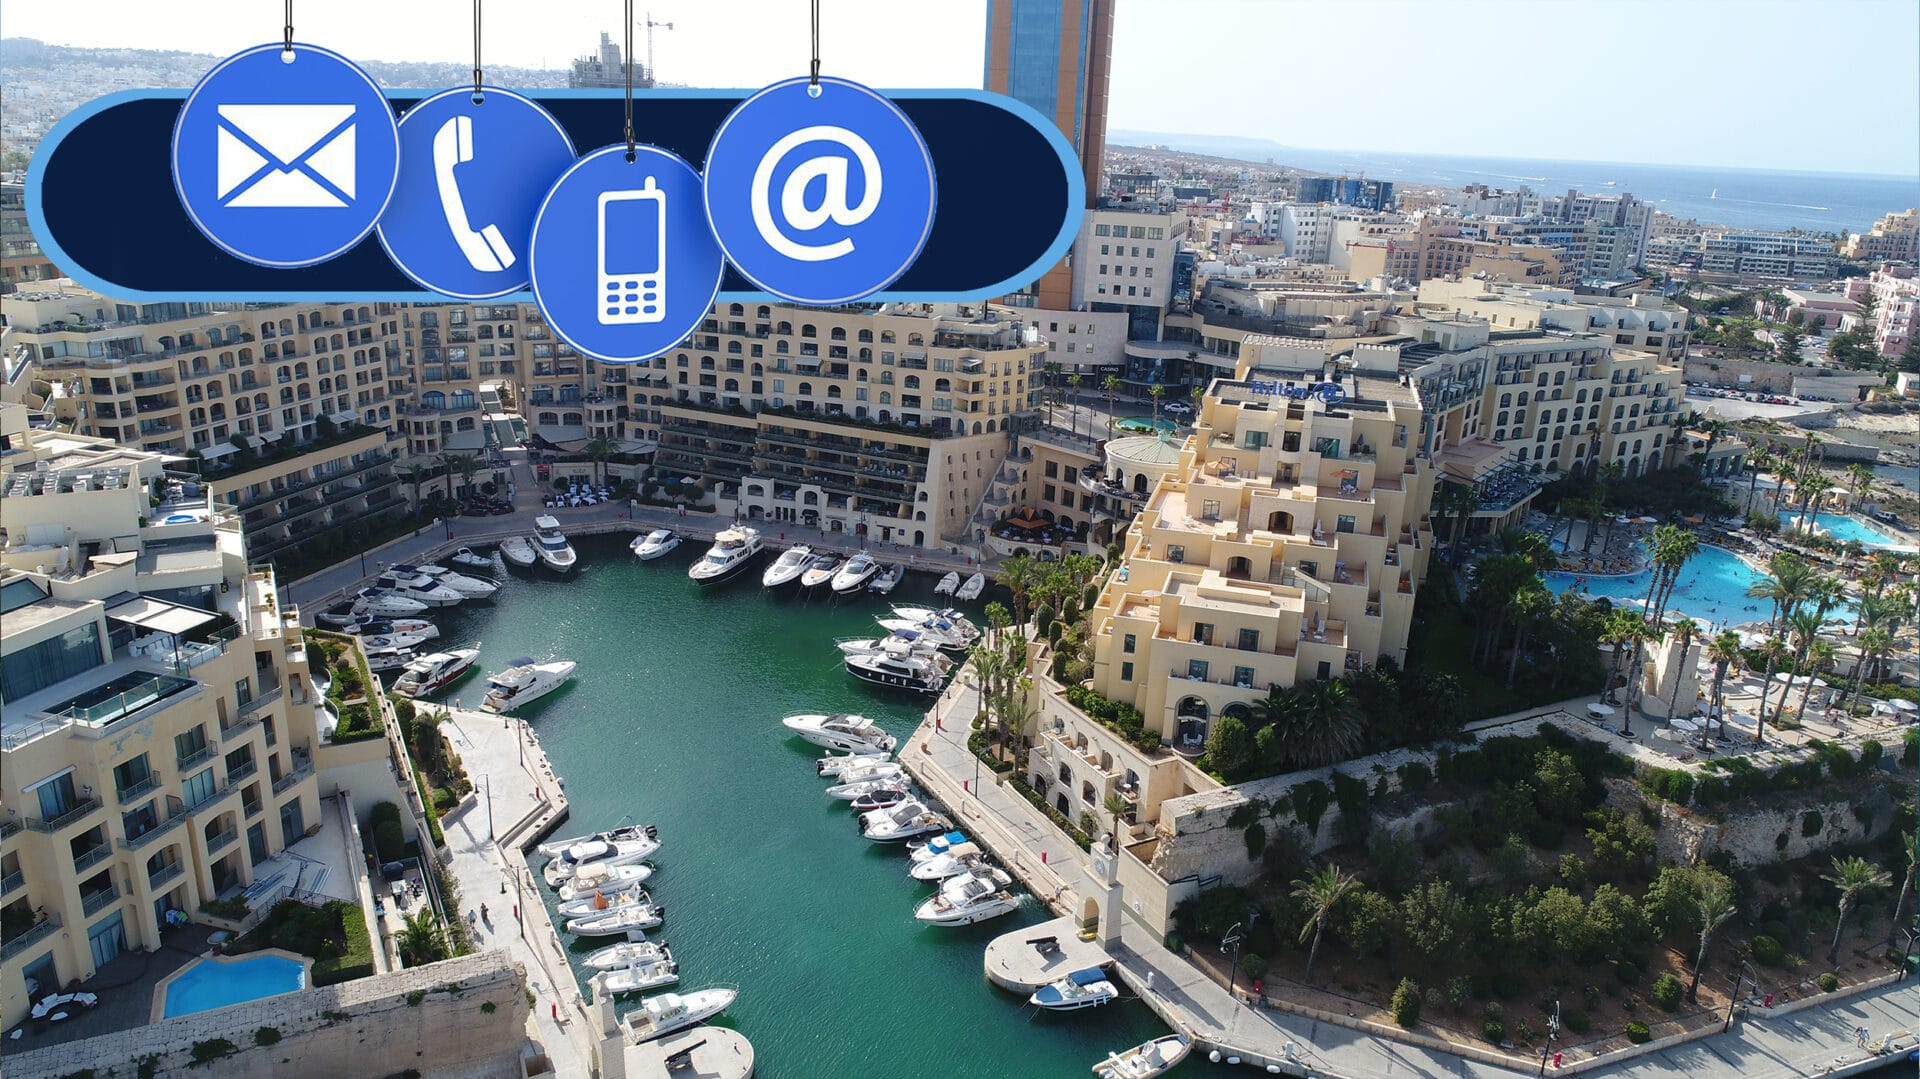 boatcare malta contact us details